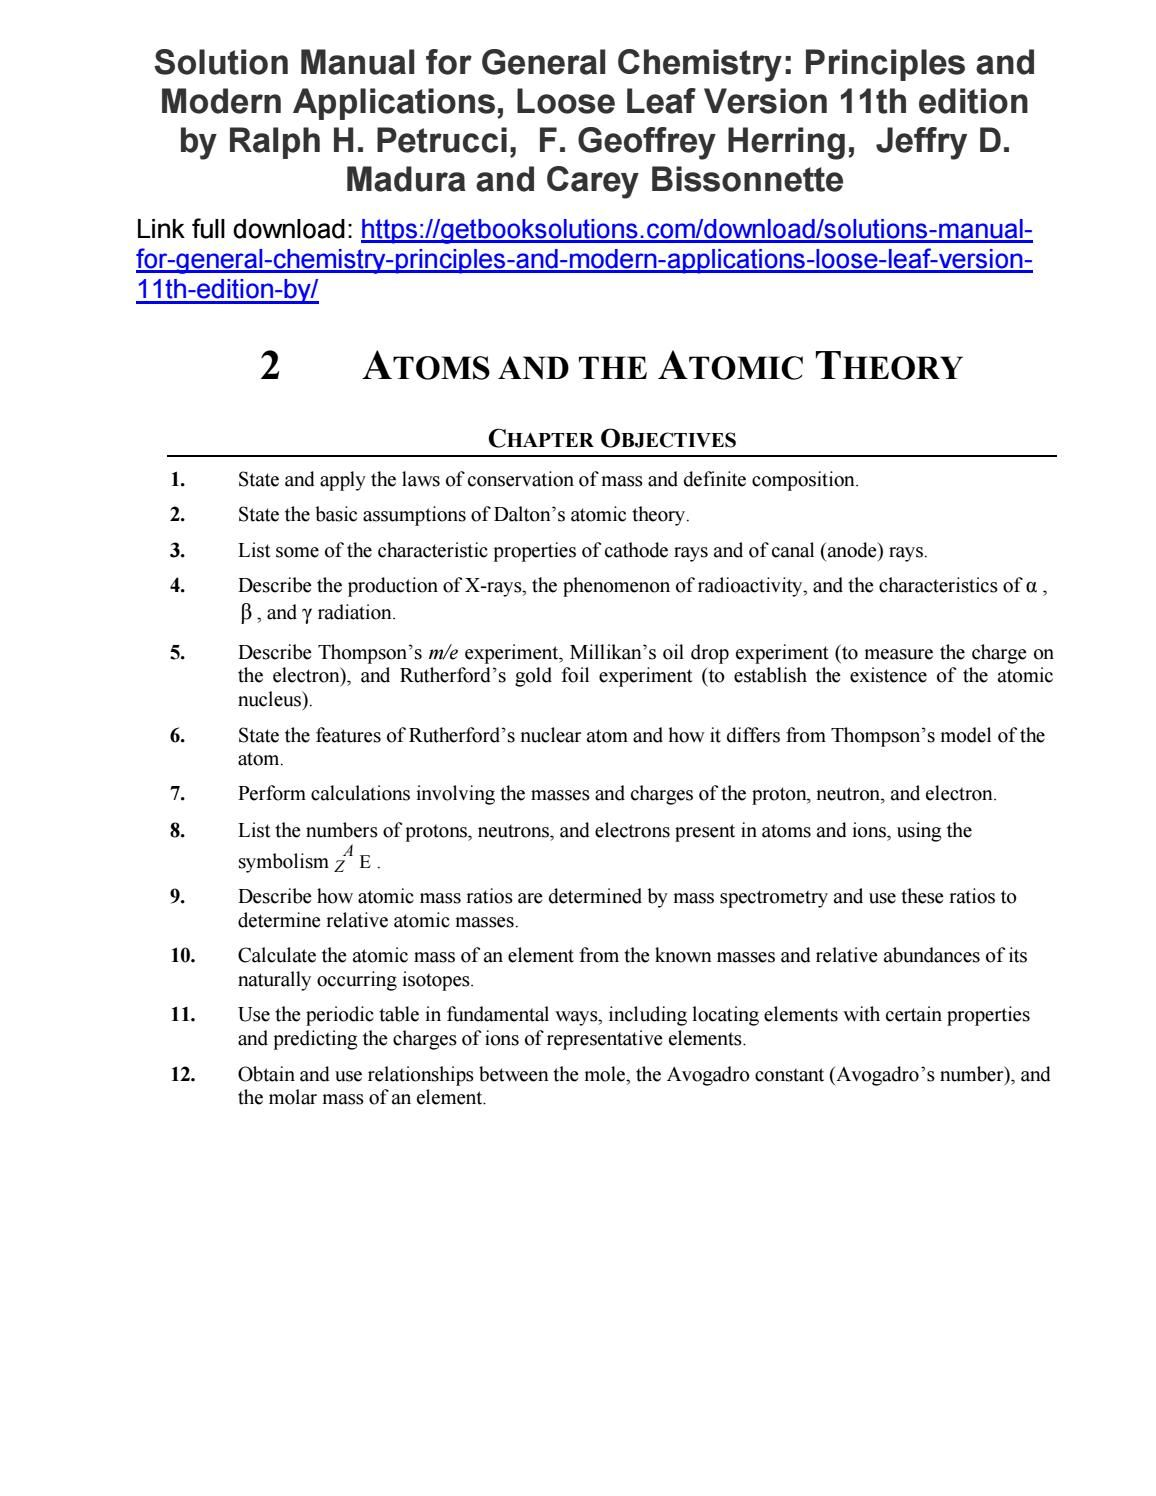 Solutions Manual General Chemistry Principles Modern